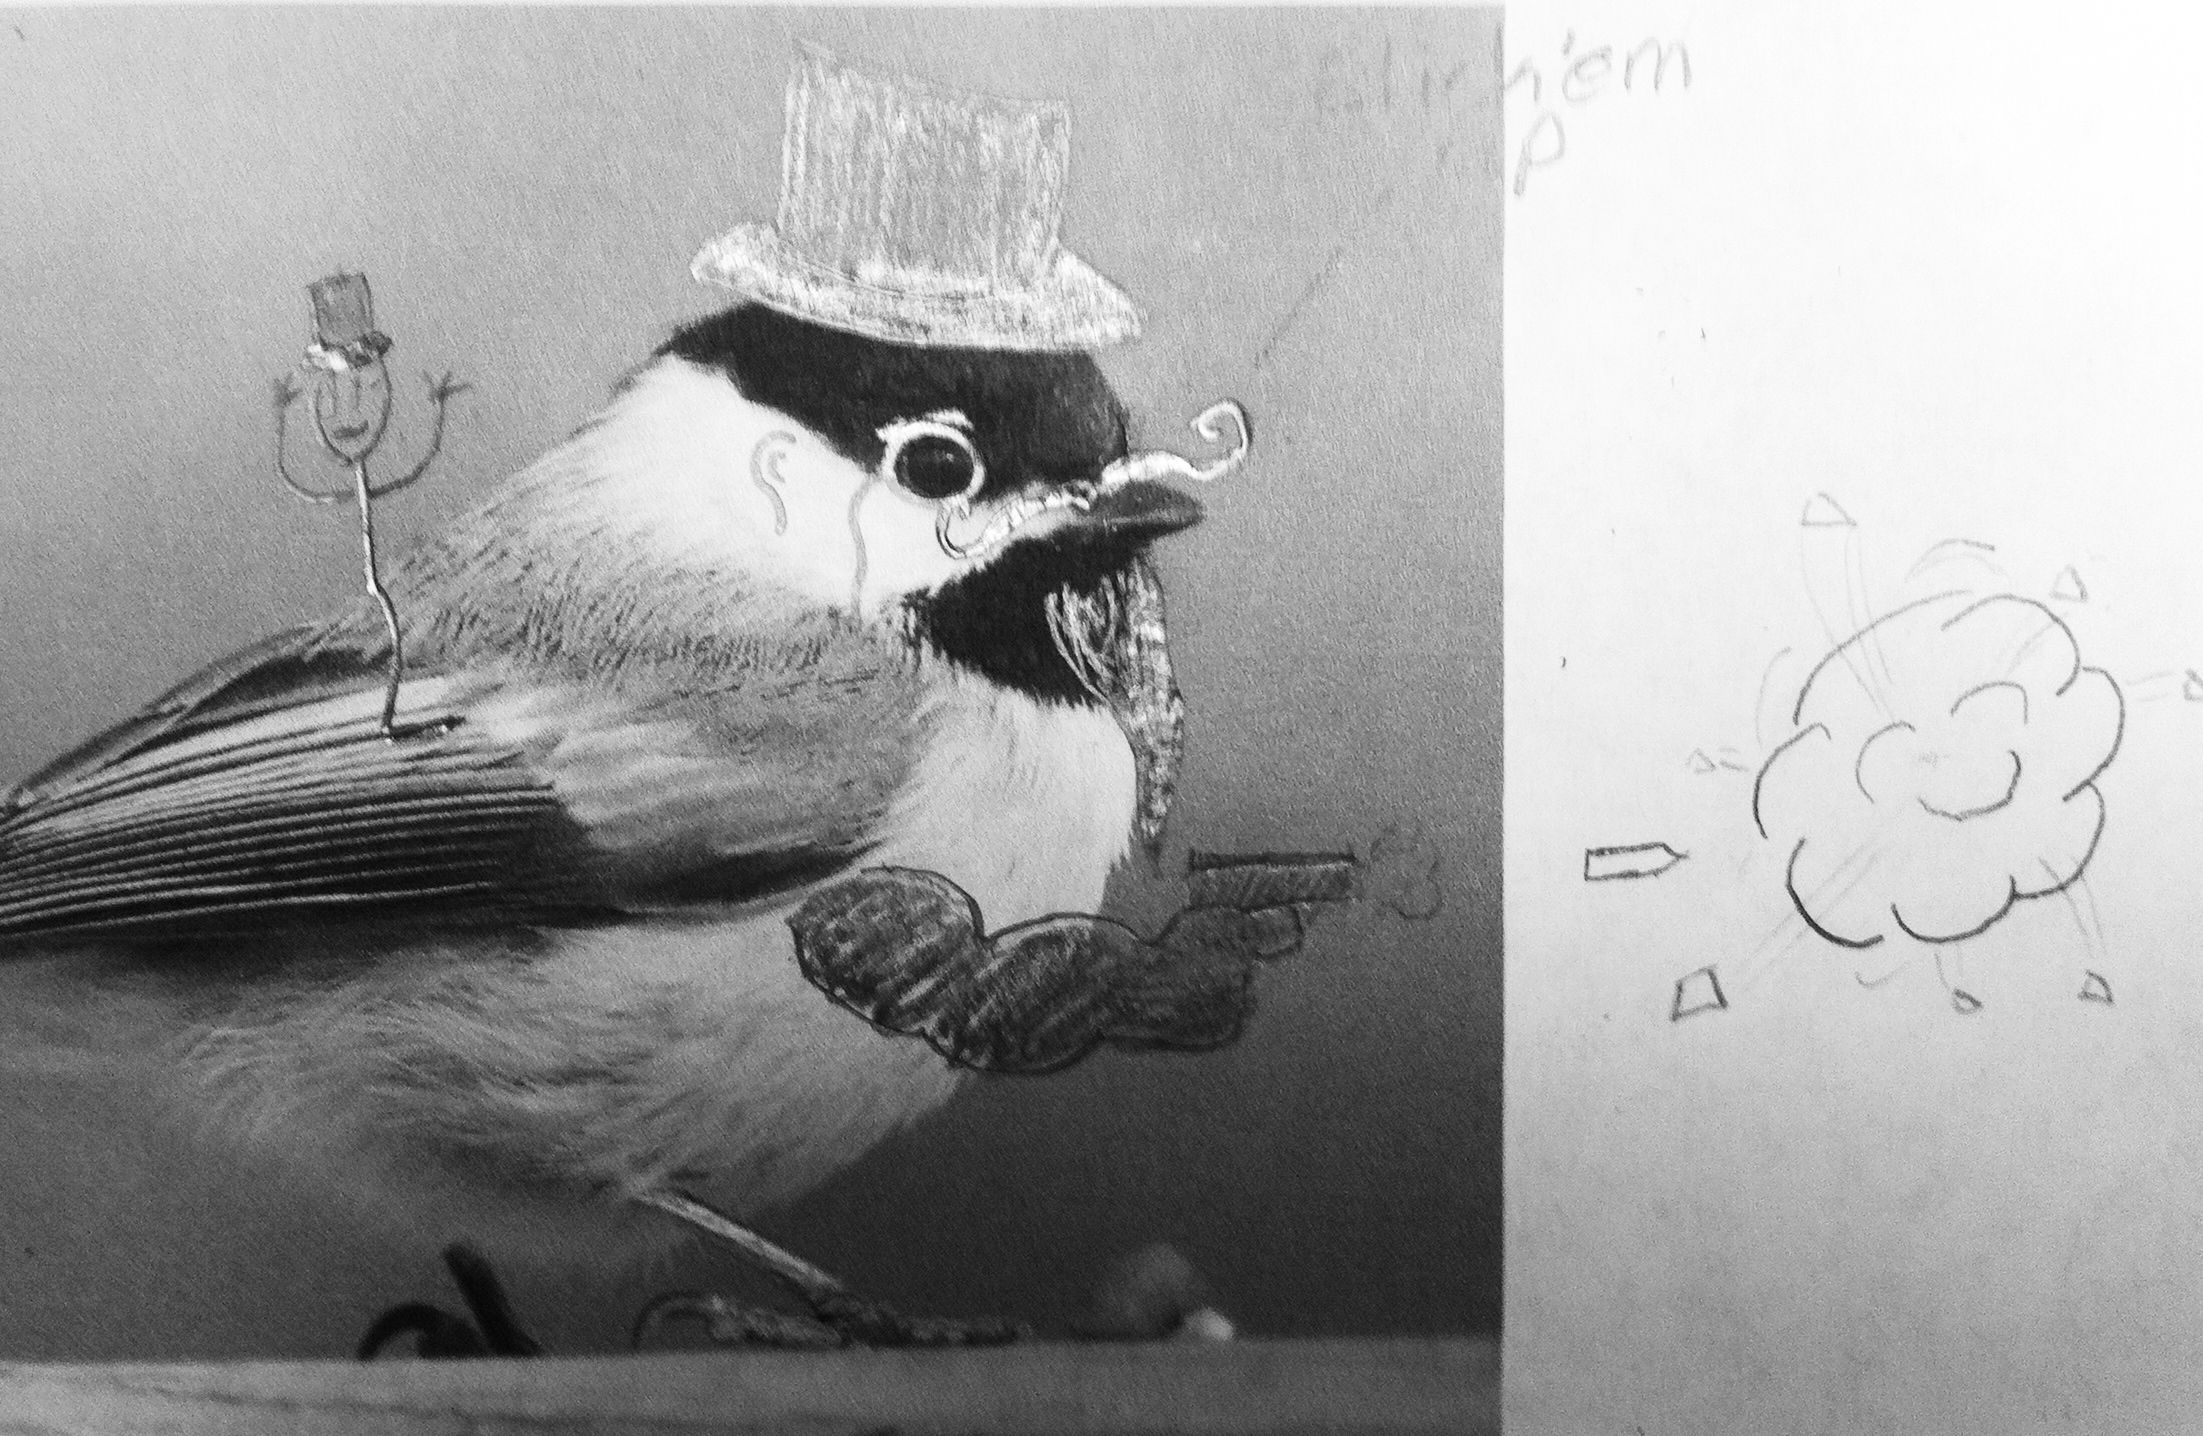 Kings doodled chickadee.JPG